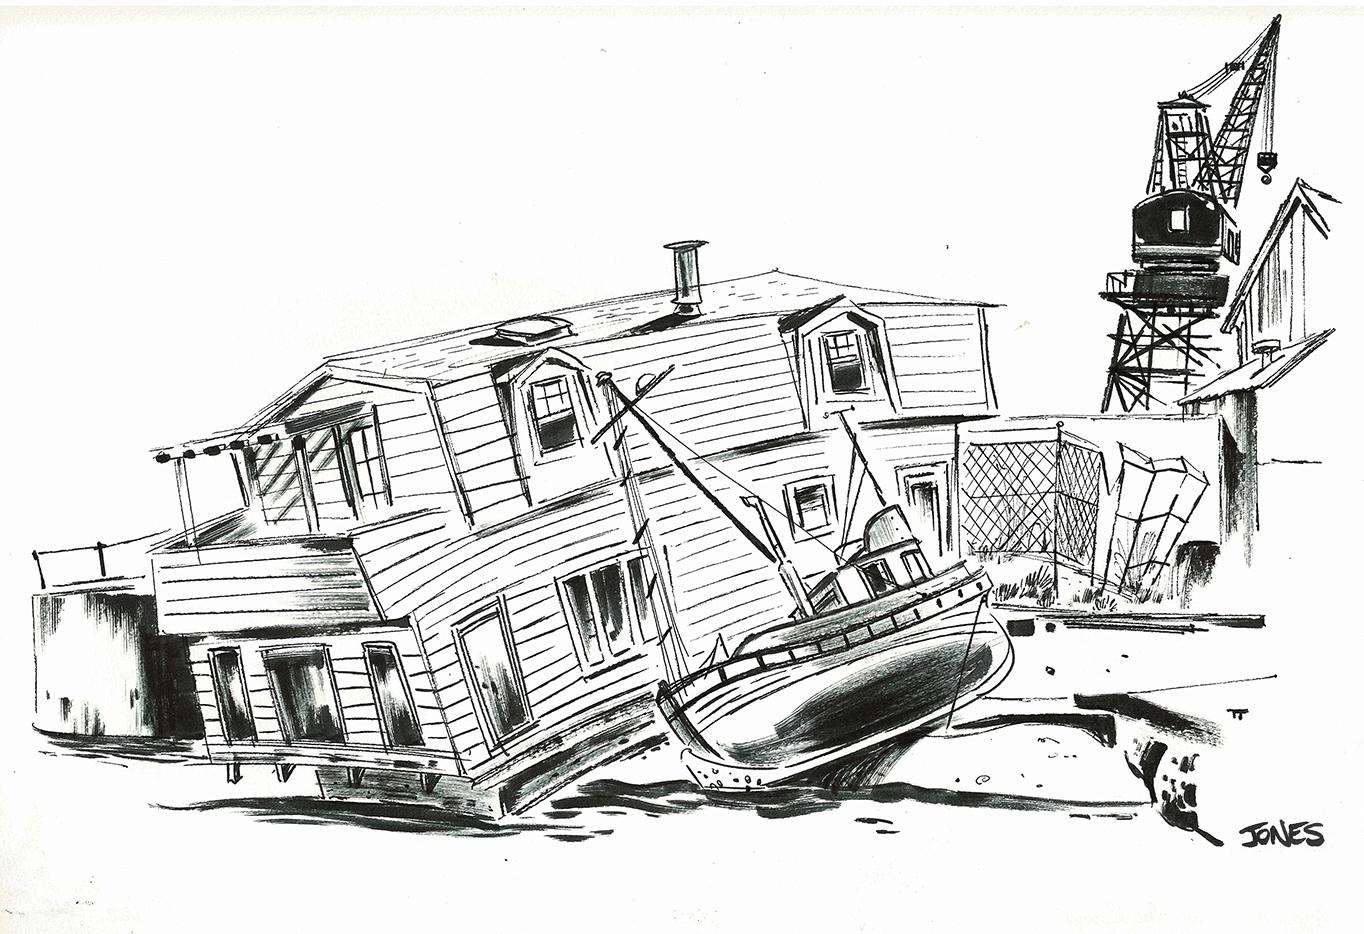 Matt Jones Winter Sketchcrawl Sfo